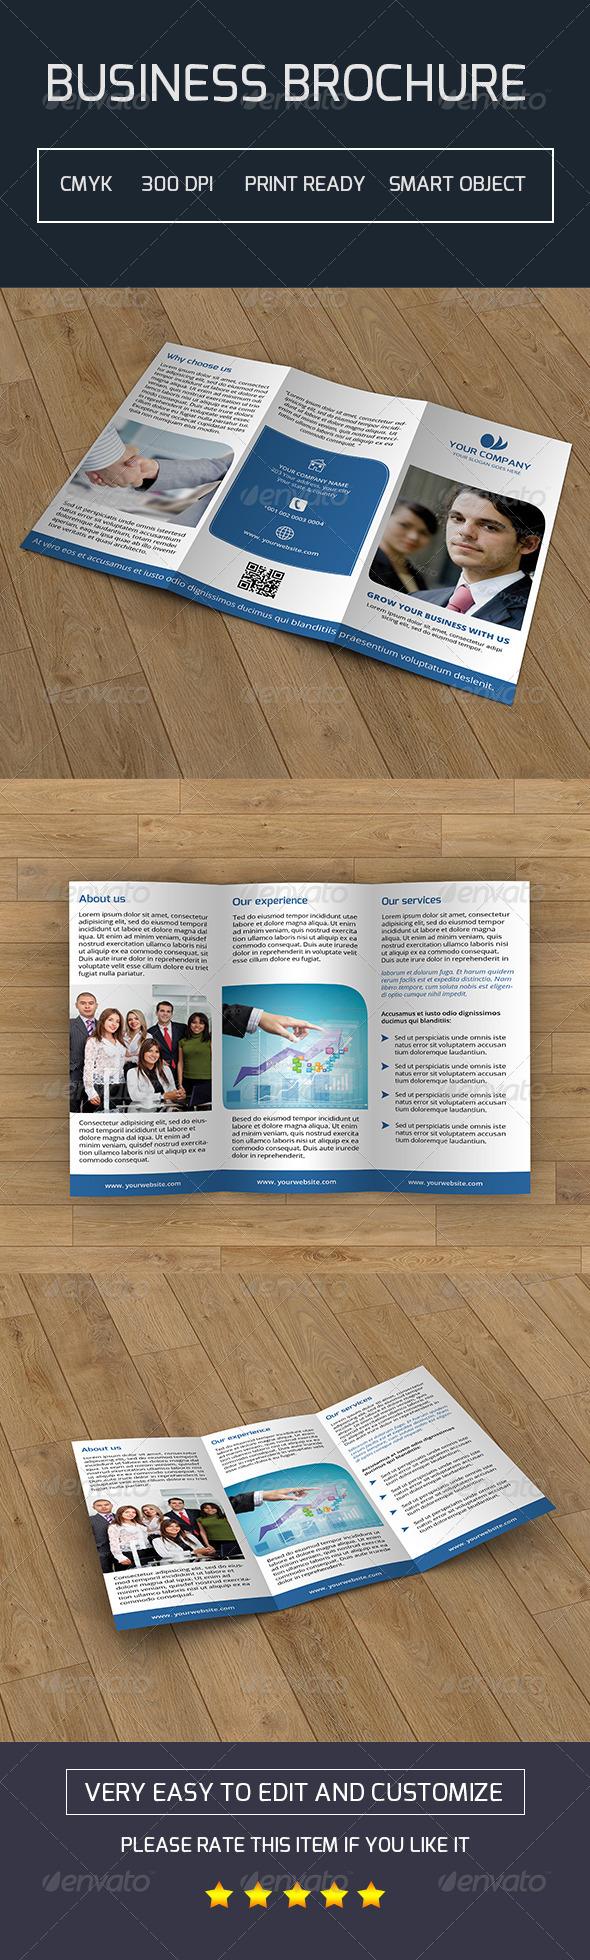 Trifold Business Brochure-V04